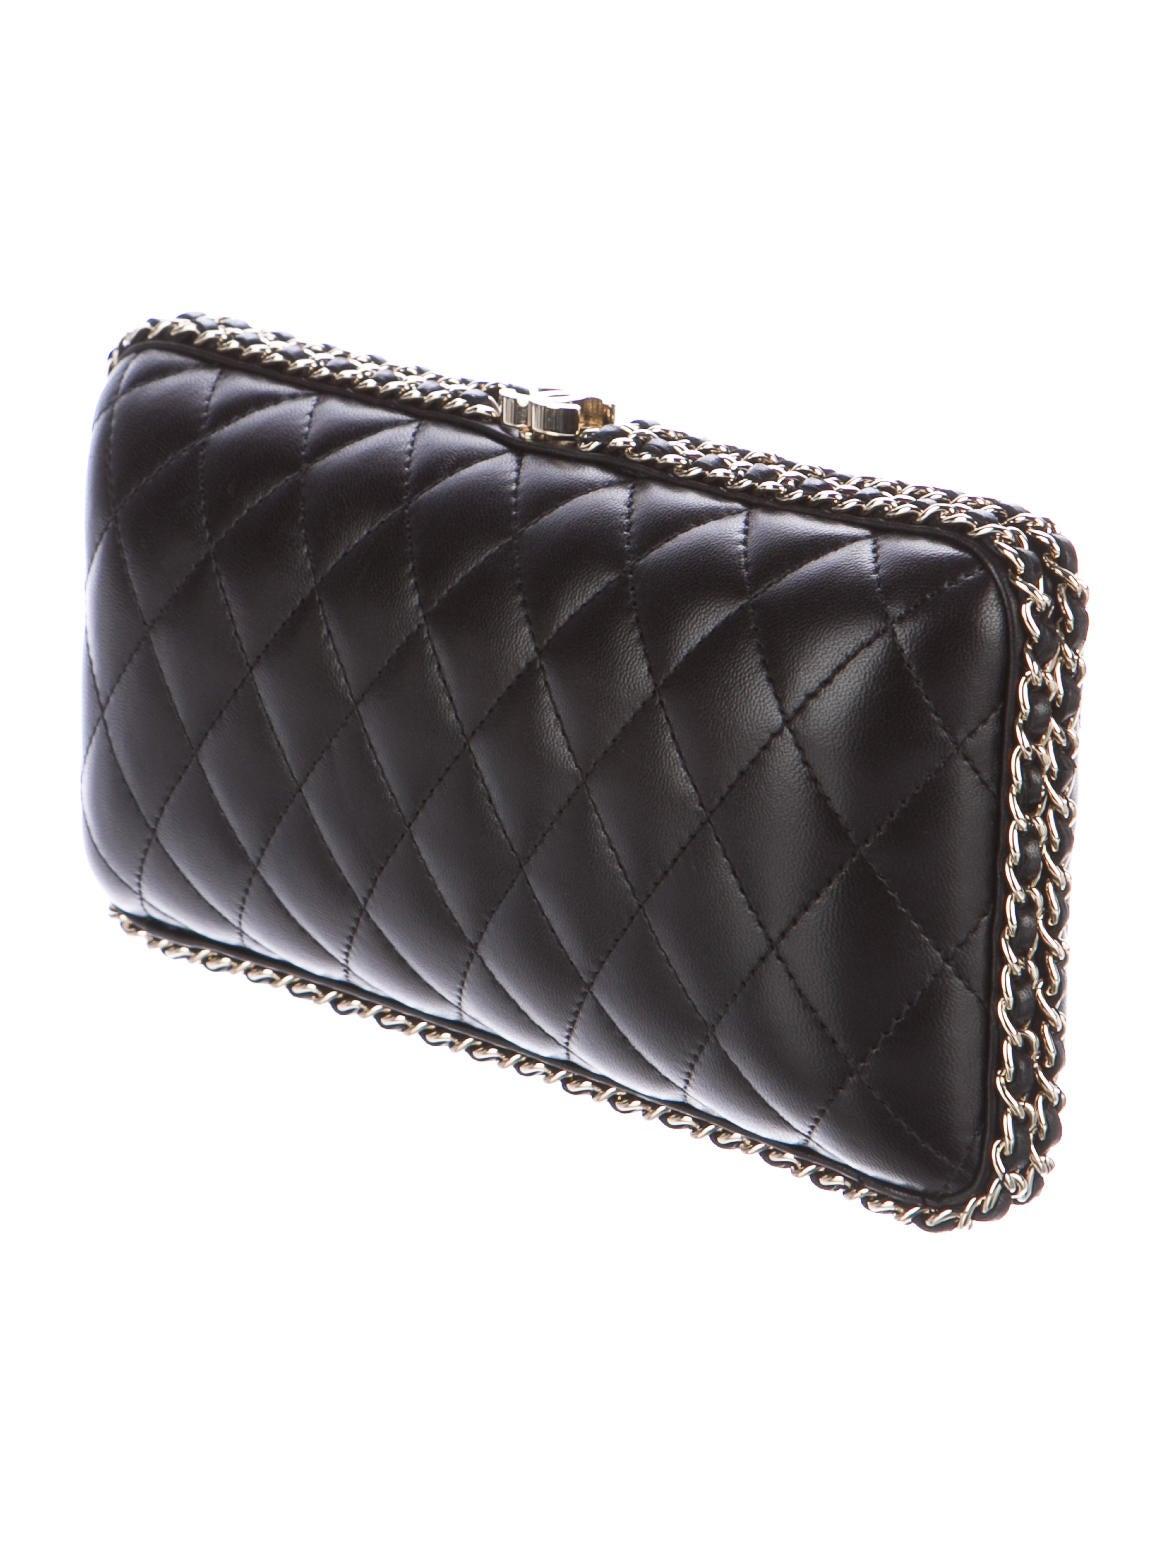 Chanel Chain Around Clutch - Handbags